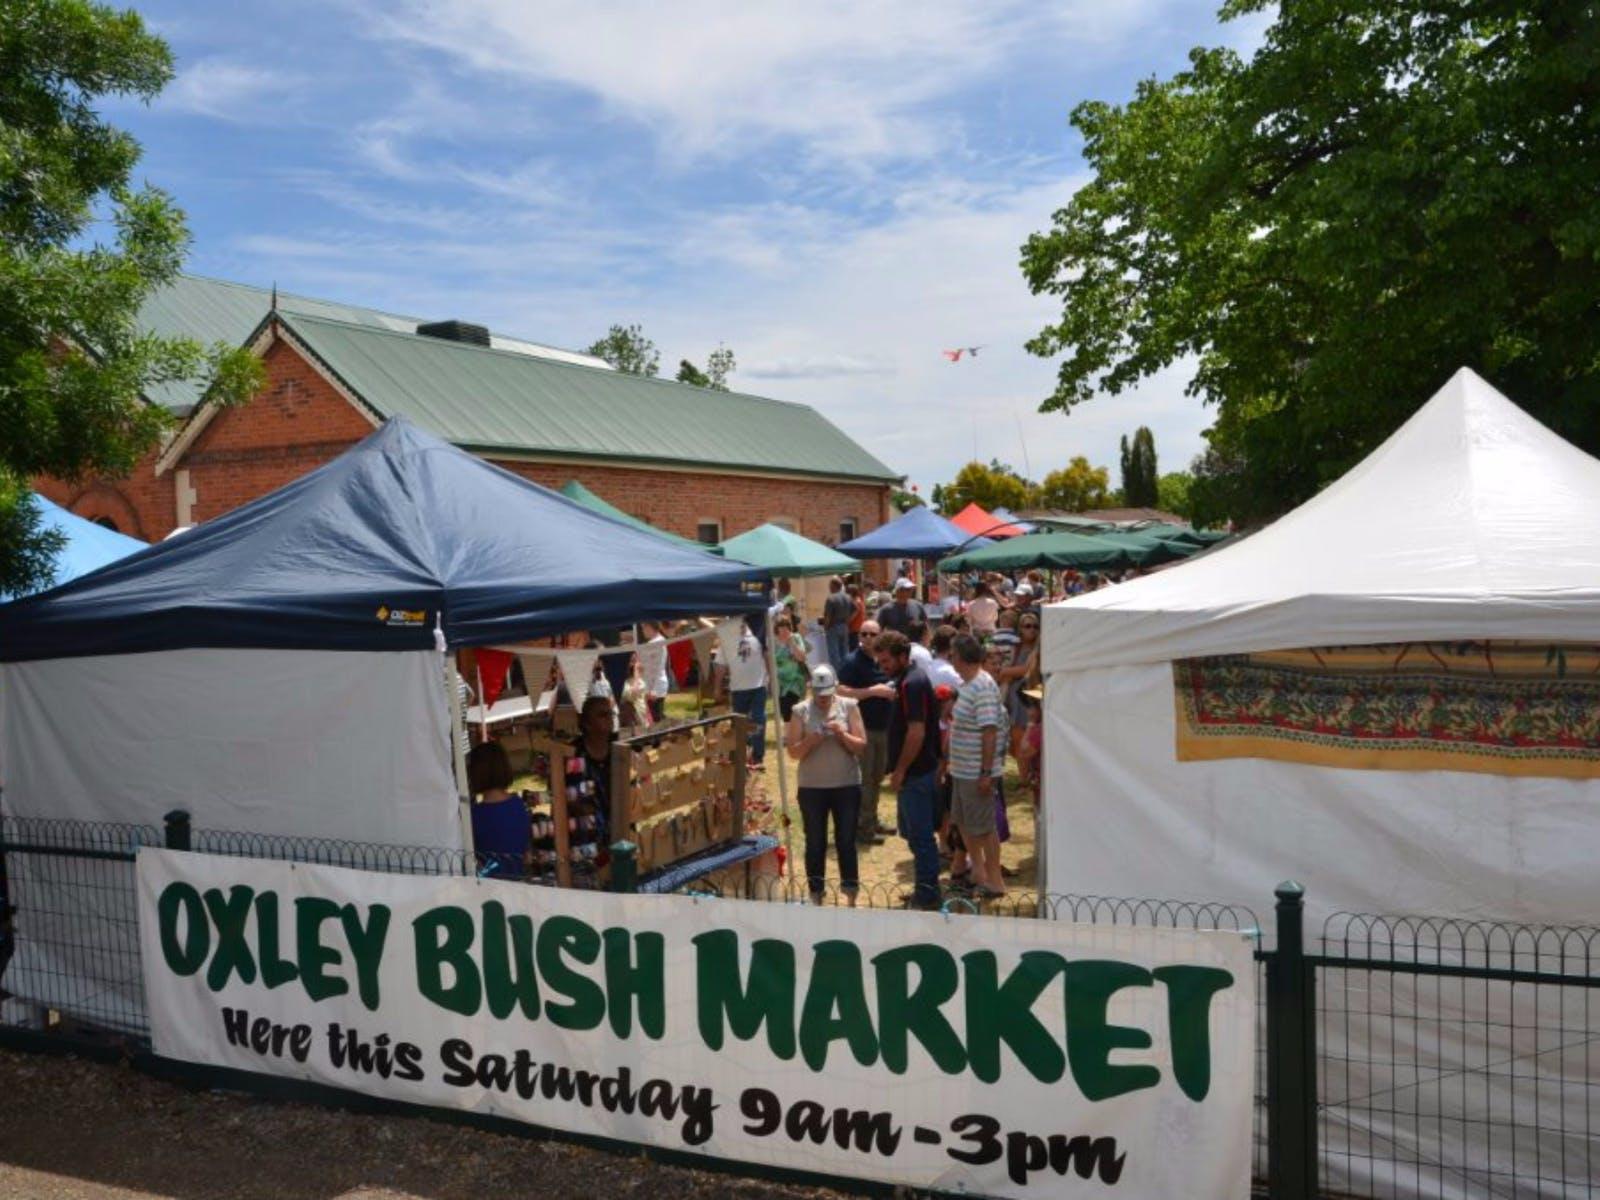 Oxley Bush Market